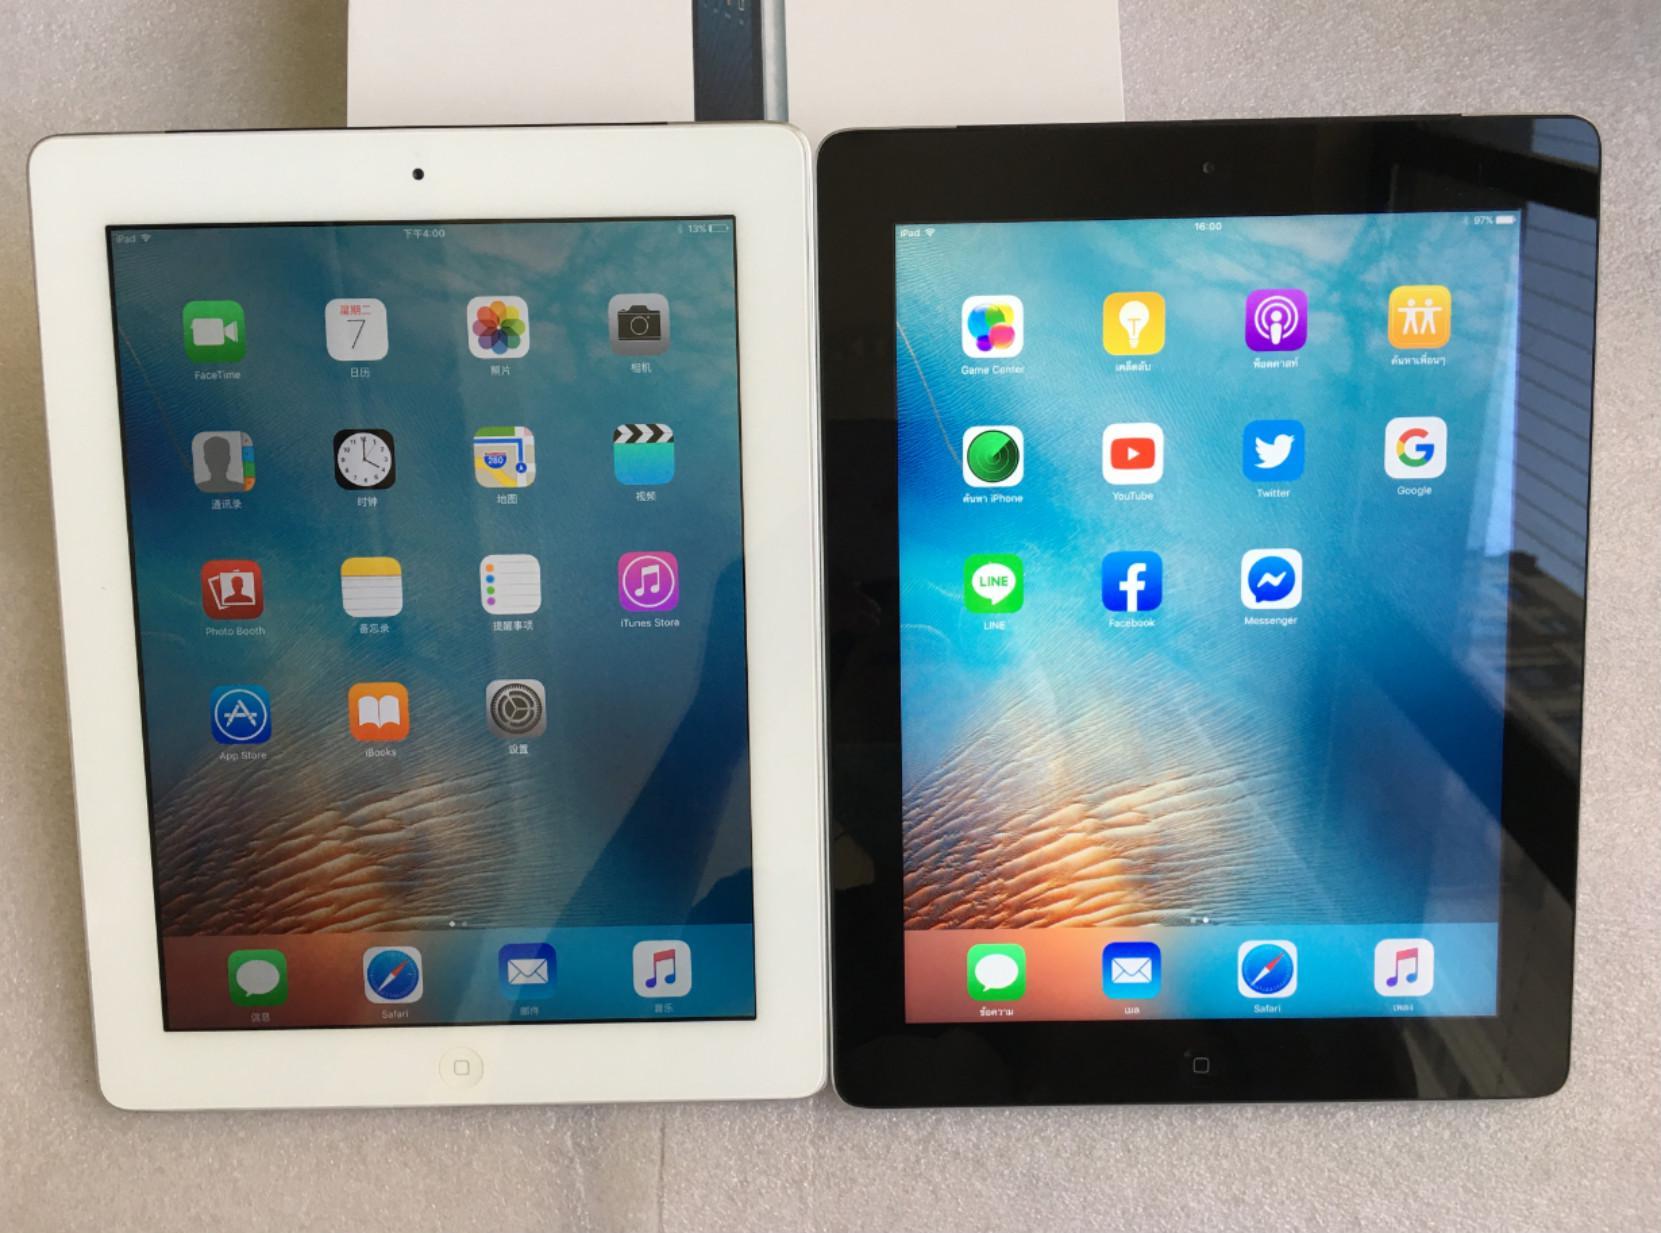 iPad 2 16GB Wifi มือสอง สภาพ 95% [ไอแพด ไอแพดมือสอง ไอแพดราคาถูก iPad iPadมือสอง มือ2 ราคาถูก]